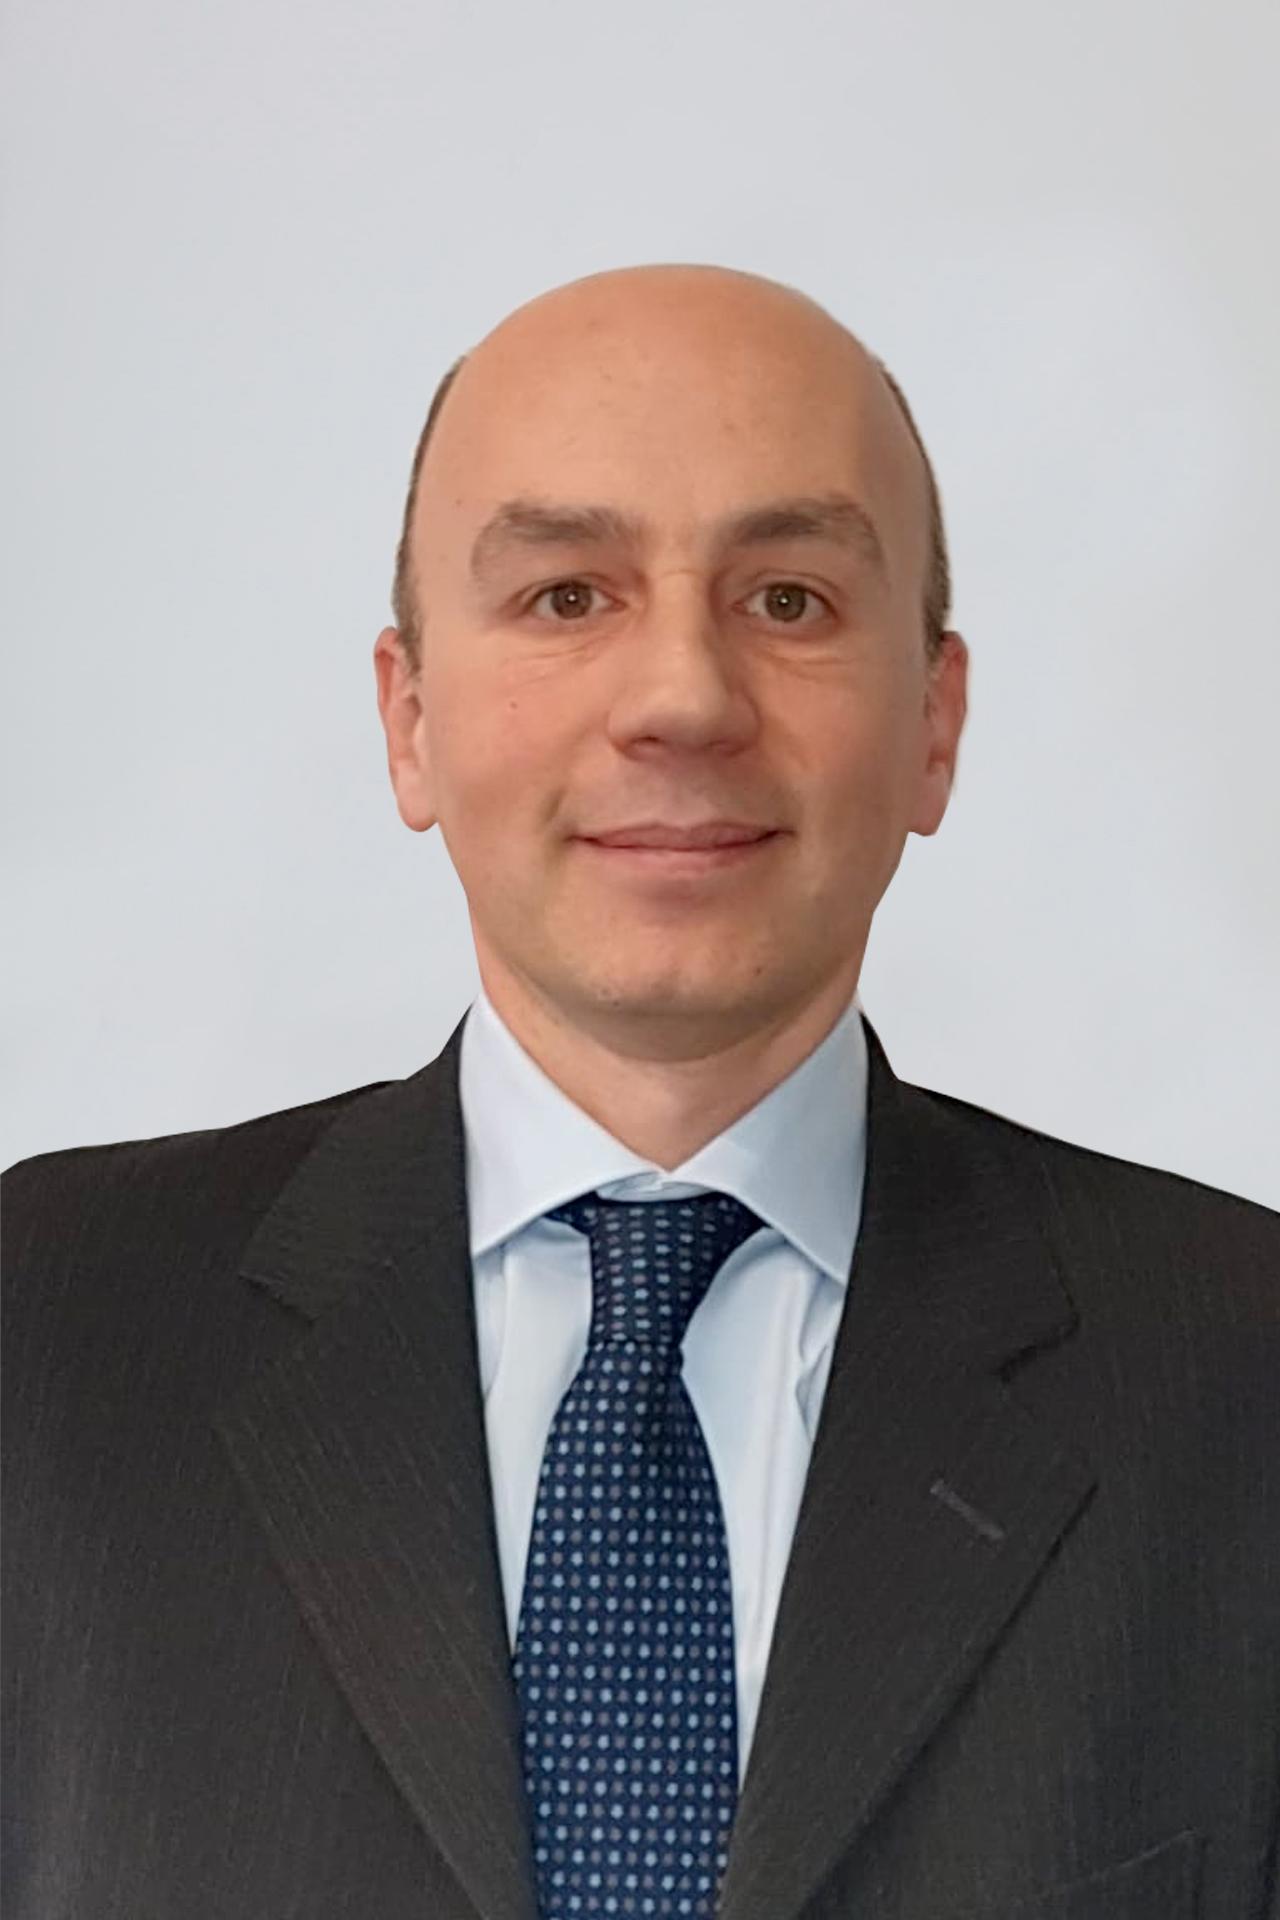 Emanuele Marrocco